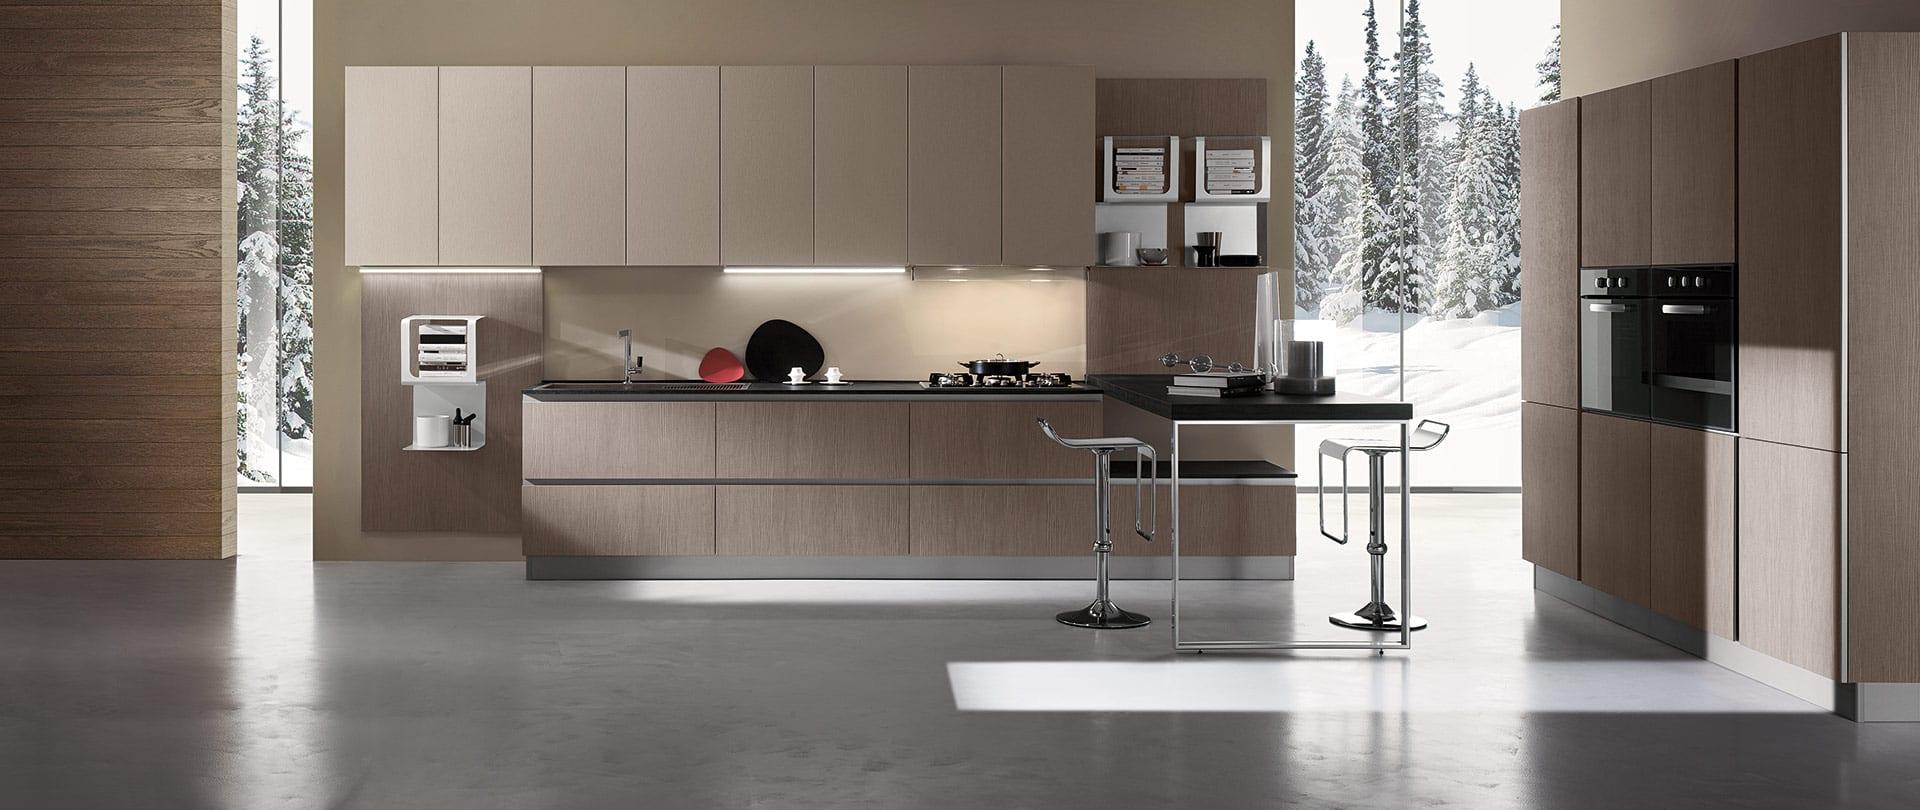 cucina-moderna-stratos-aleve-cenere-matt-argilla